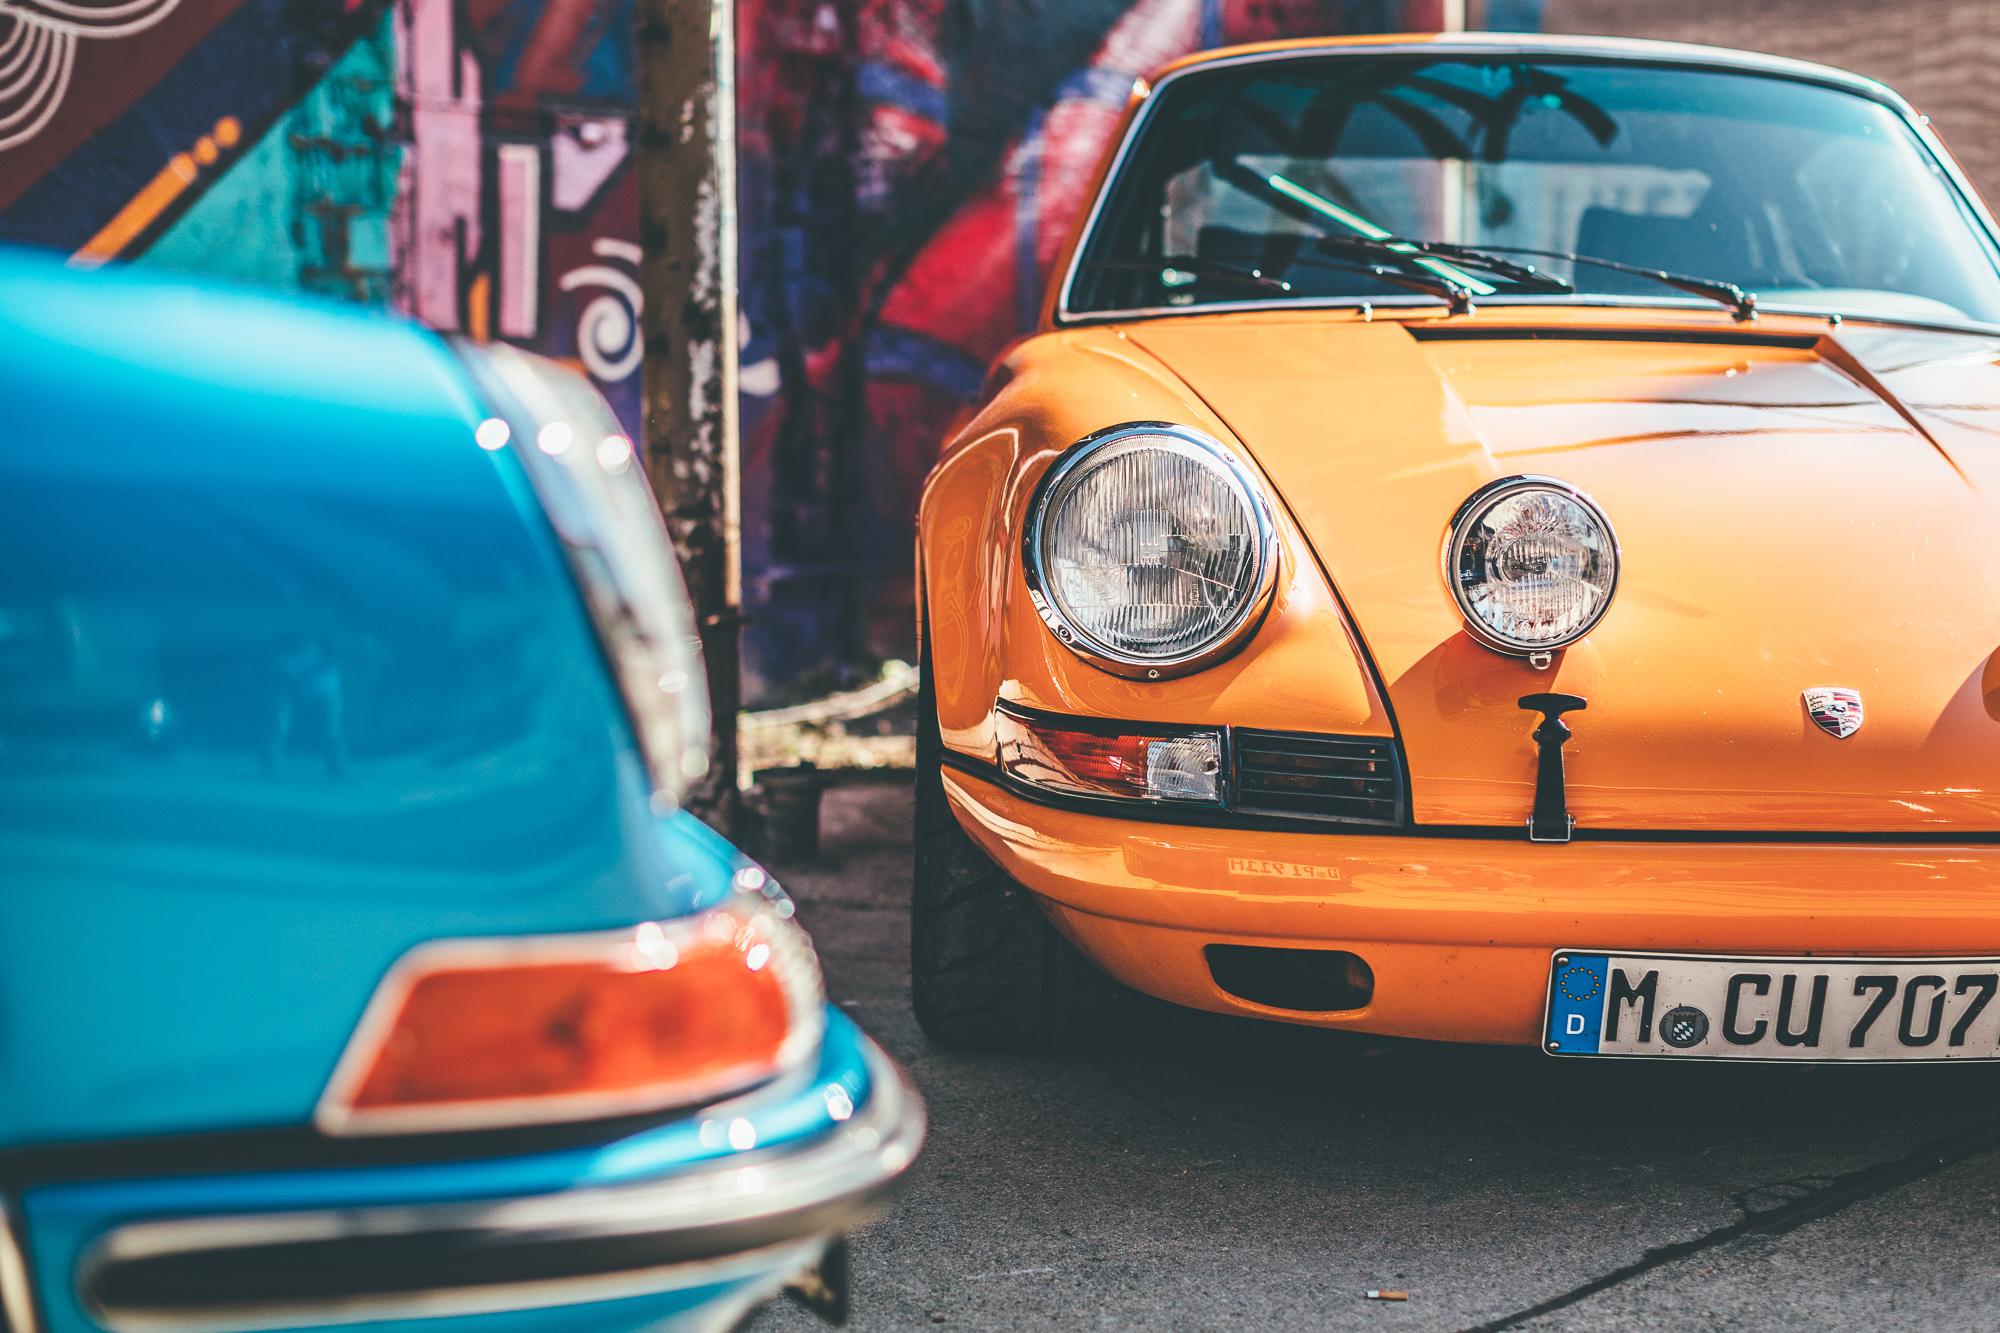 LUFTGEKÜHLT MUNICH: THE BEST LOOKING CAR GATHERING EUROPE HAS EVER SEEN